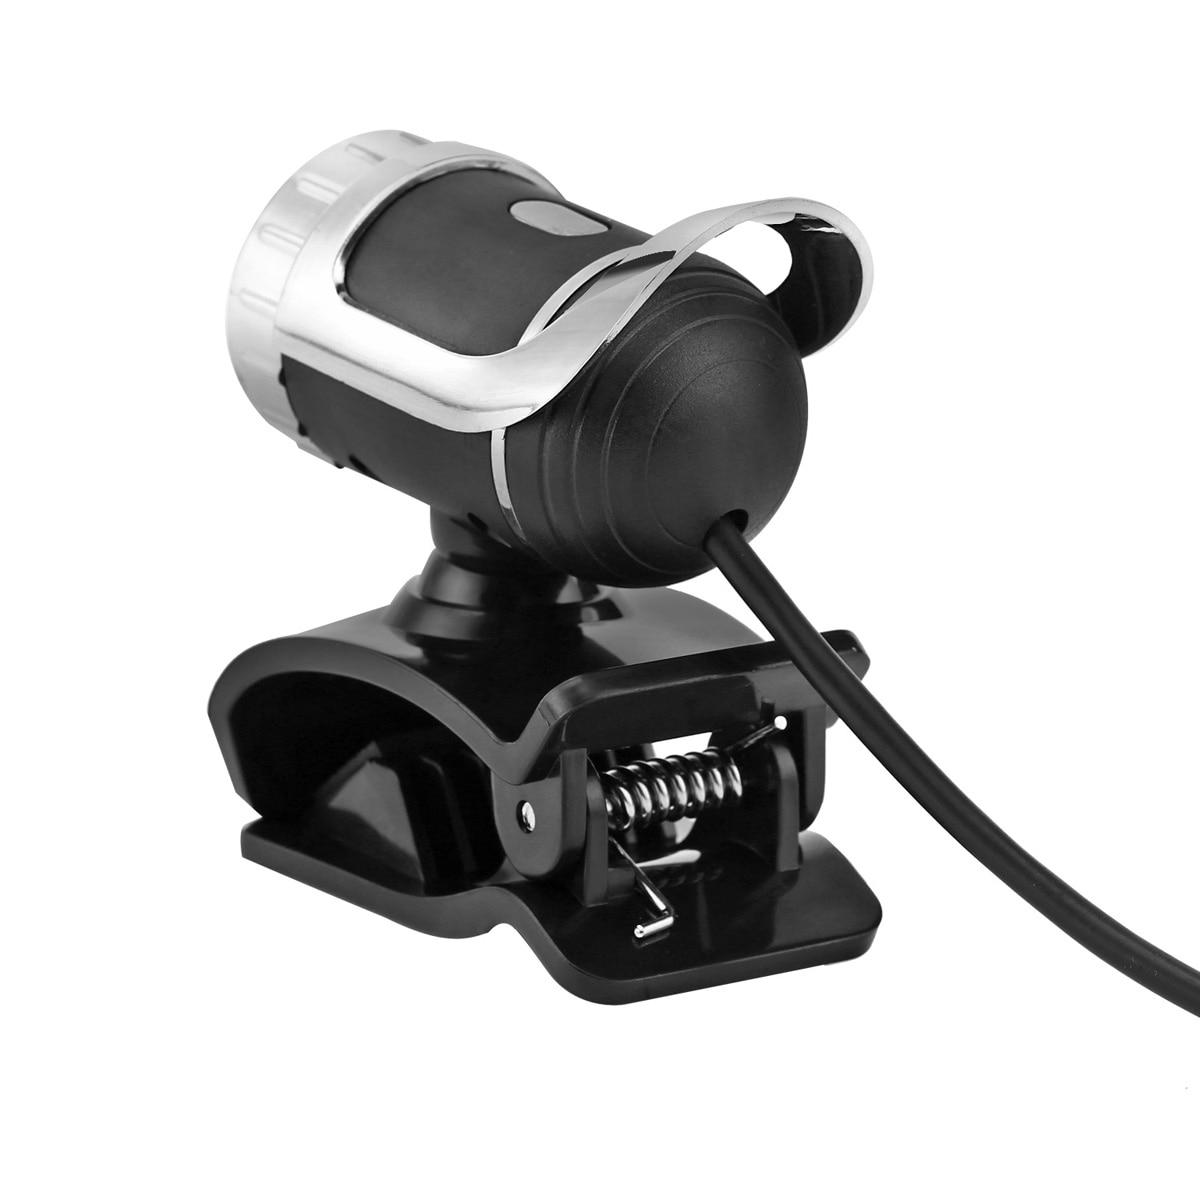 360 Degrees Rotatable Clip-on USB Webcam with Adjustable Focal Length Lens for Laptop/Desktop 3